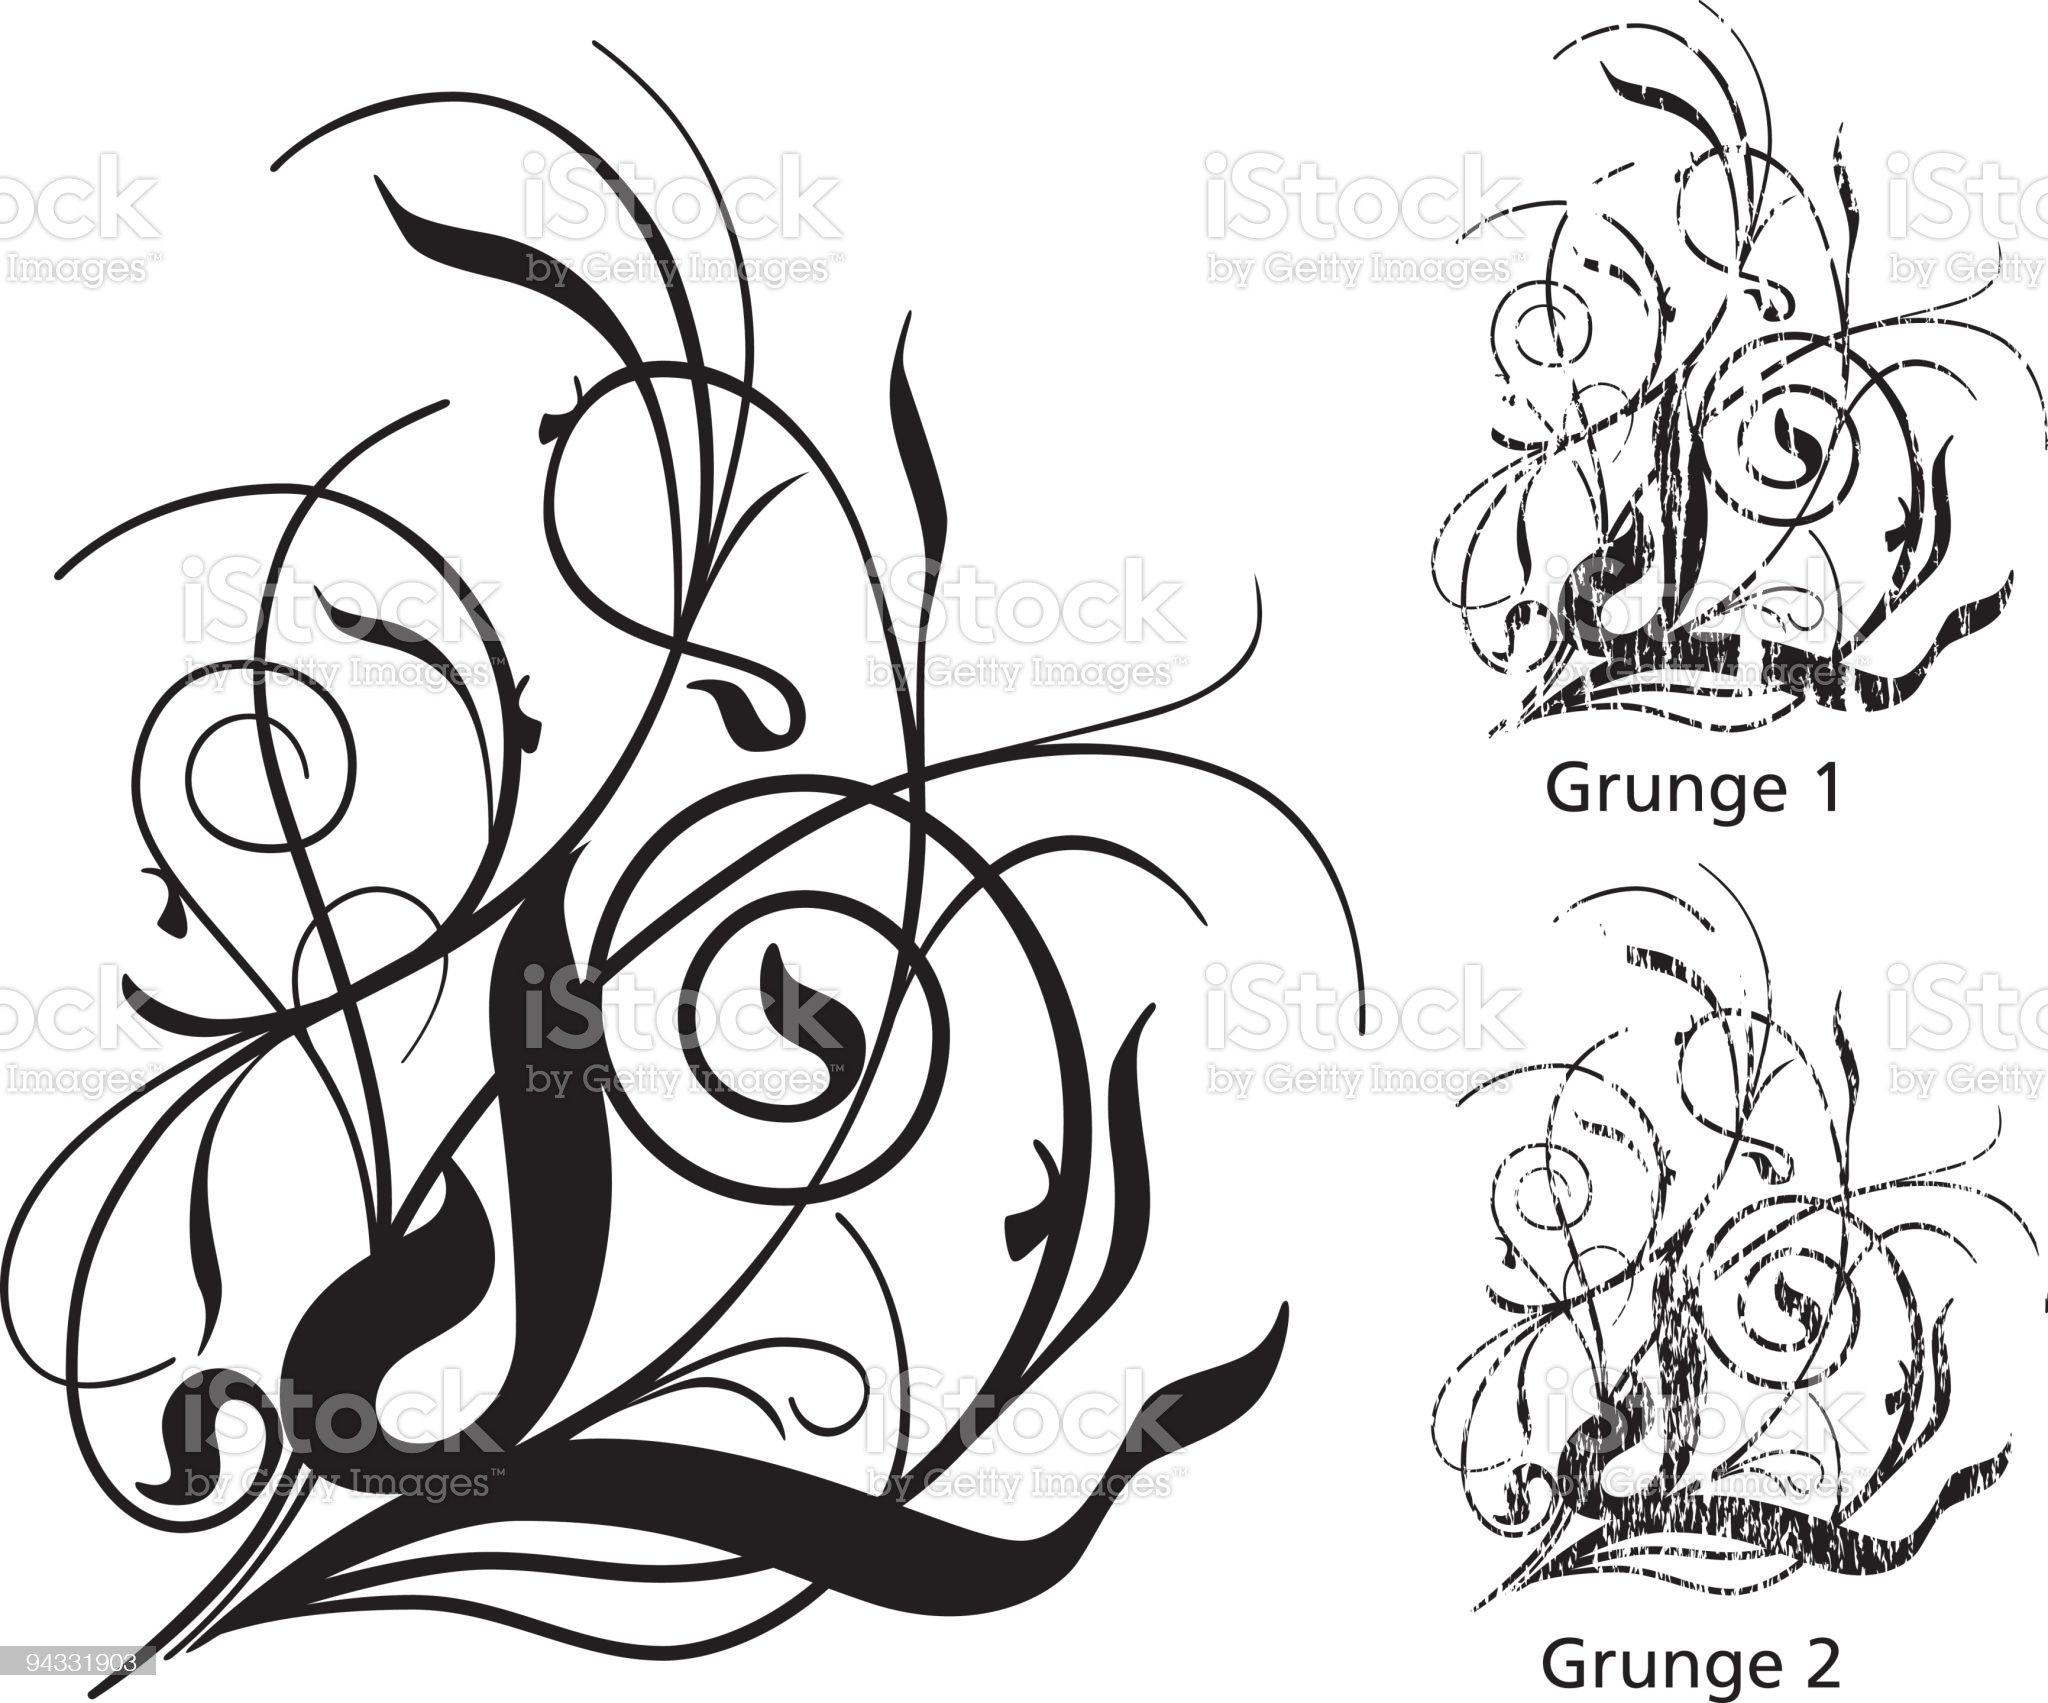 Grunge Scroll Series royalty-free stock vector art